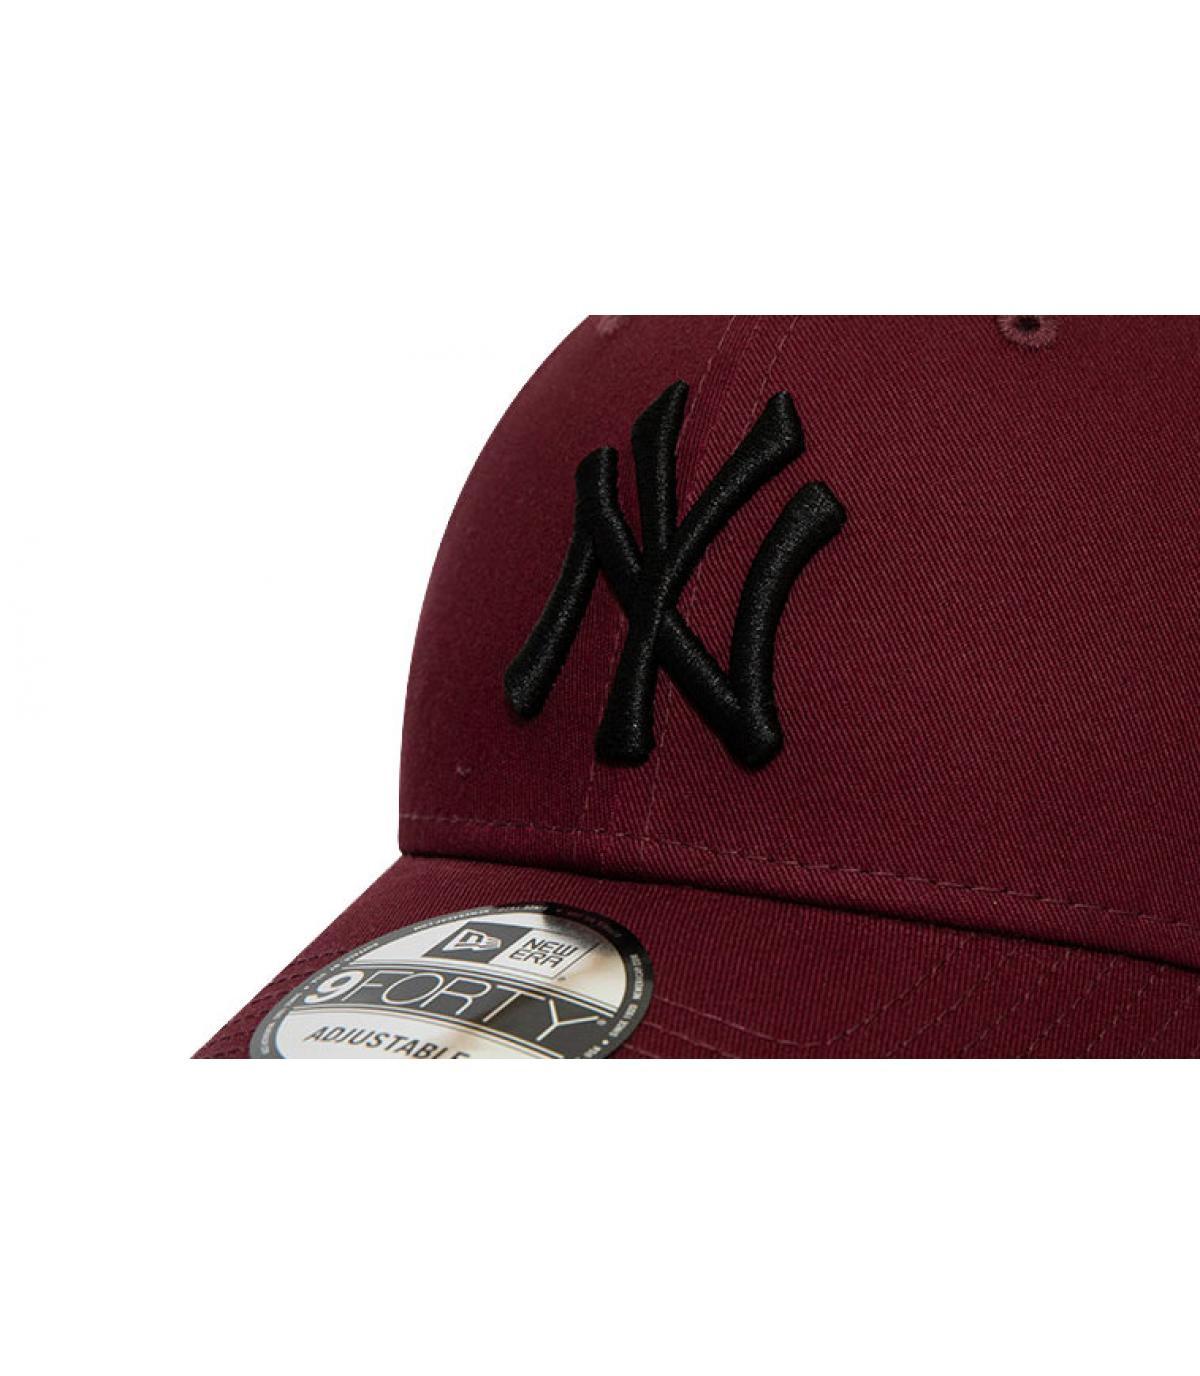 Details Cap Kids League Ess NY 940 maroon black - Abbildung 3